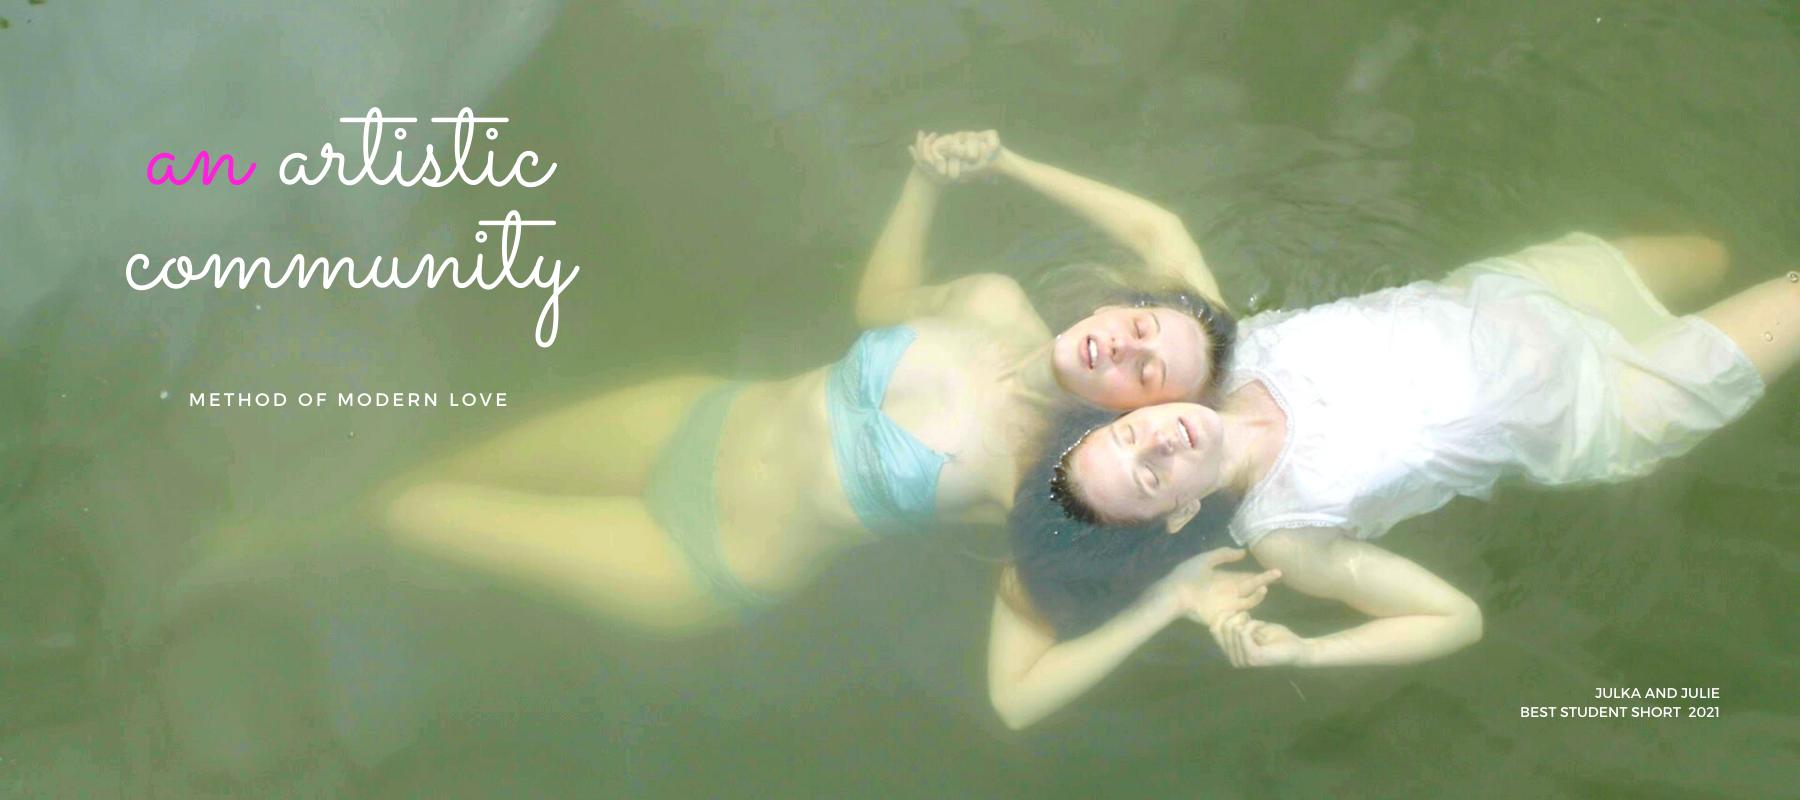 <a href='https://lovestoryfilmfestival.com/lgbtq-love-story'></a>